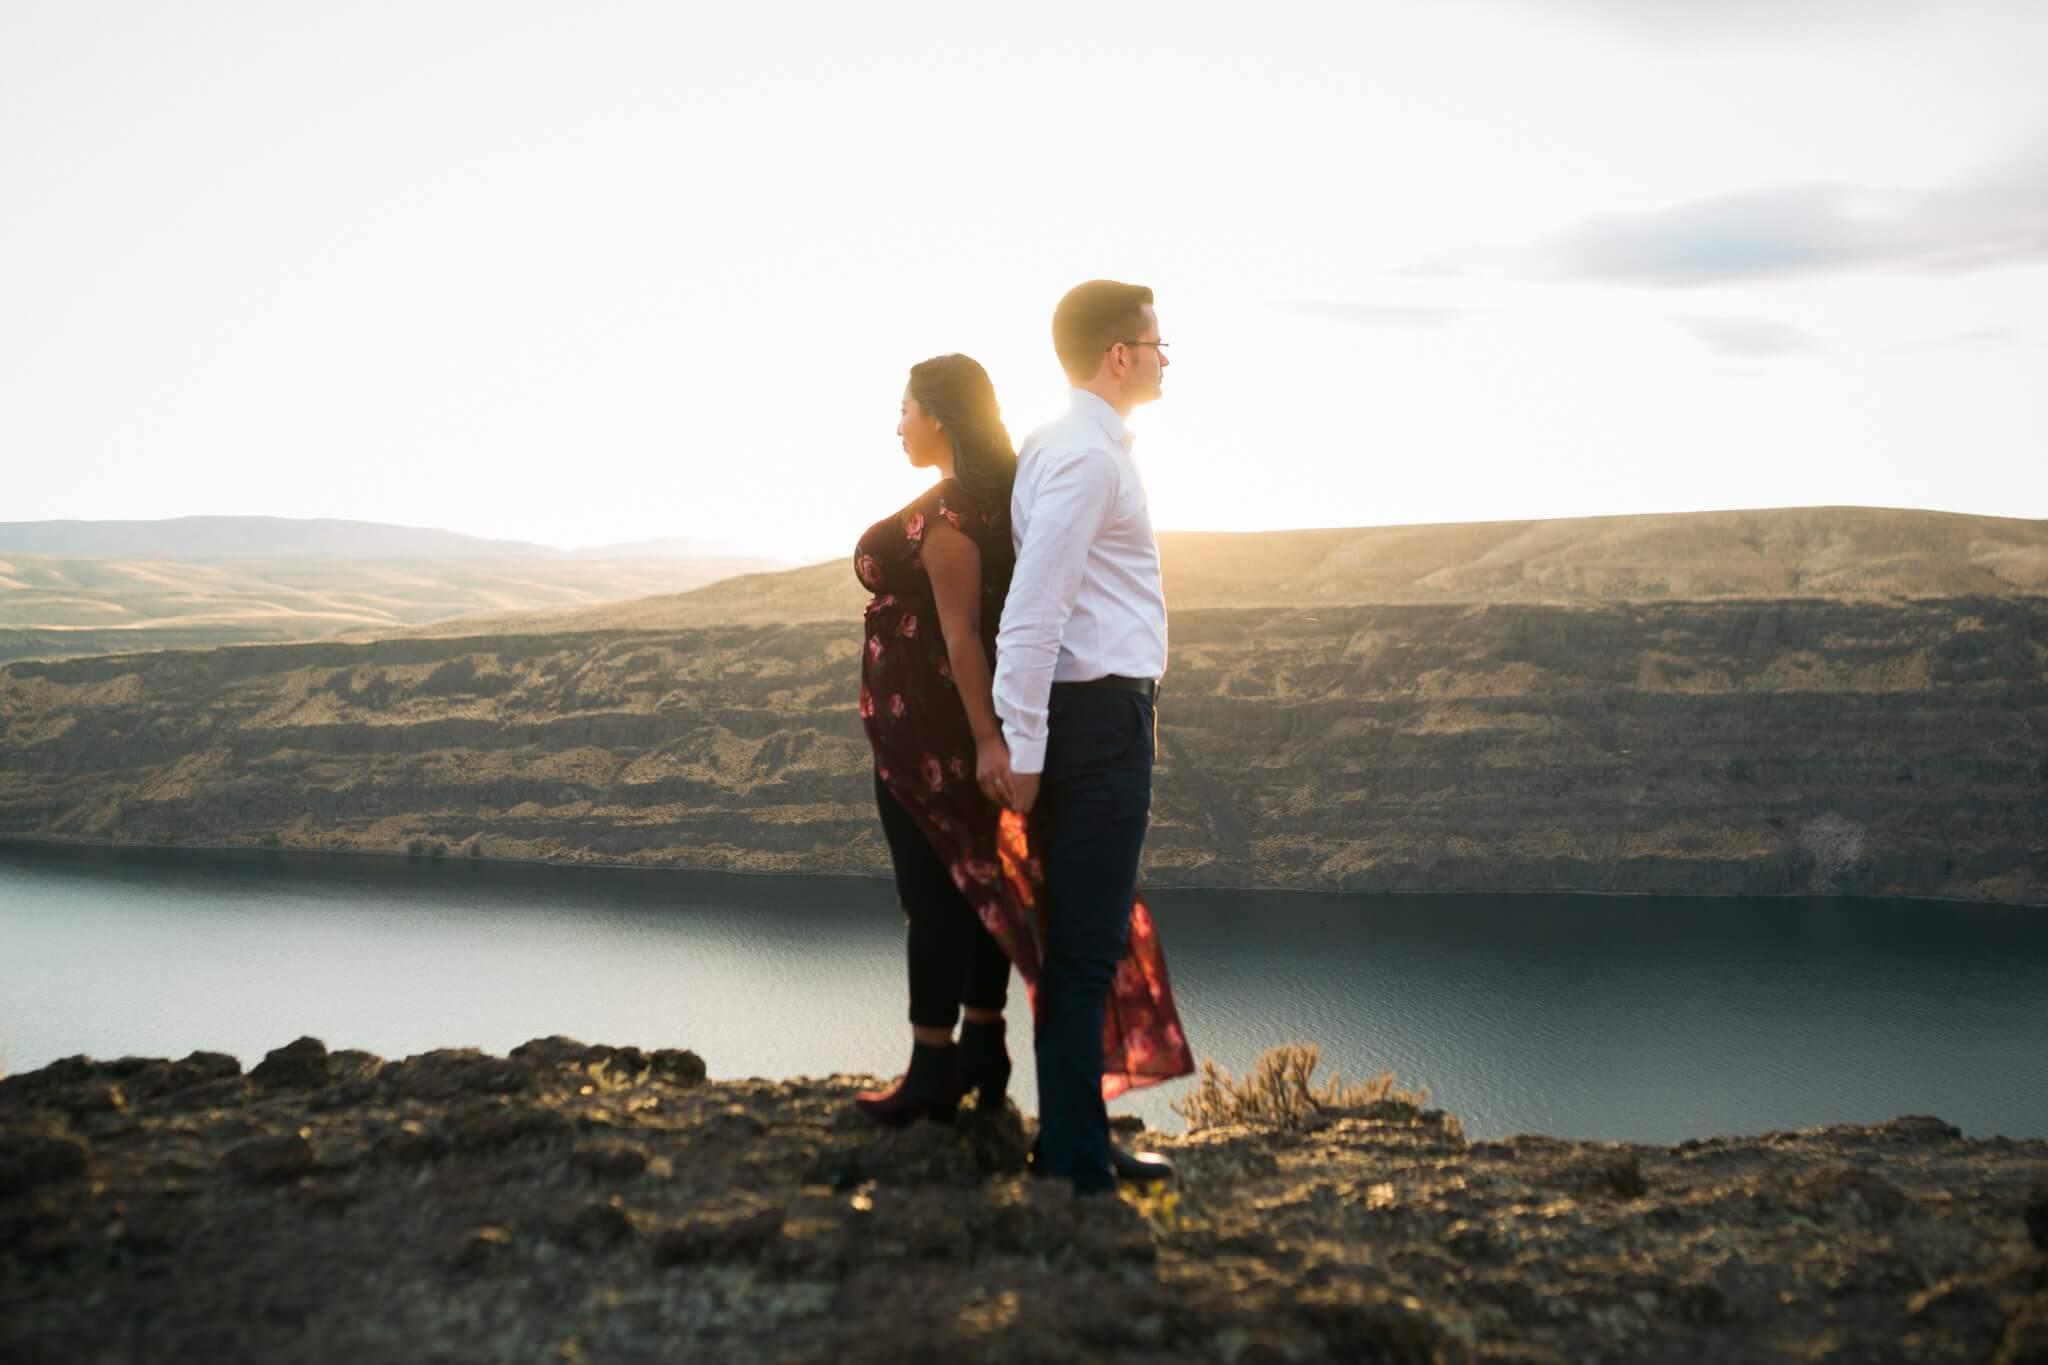 Lesly & Michael Vantage Engagement by Bill Weisgerber Spokane Photographer (46 of 71).jpg